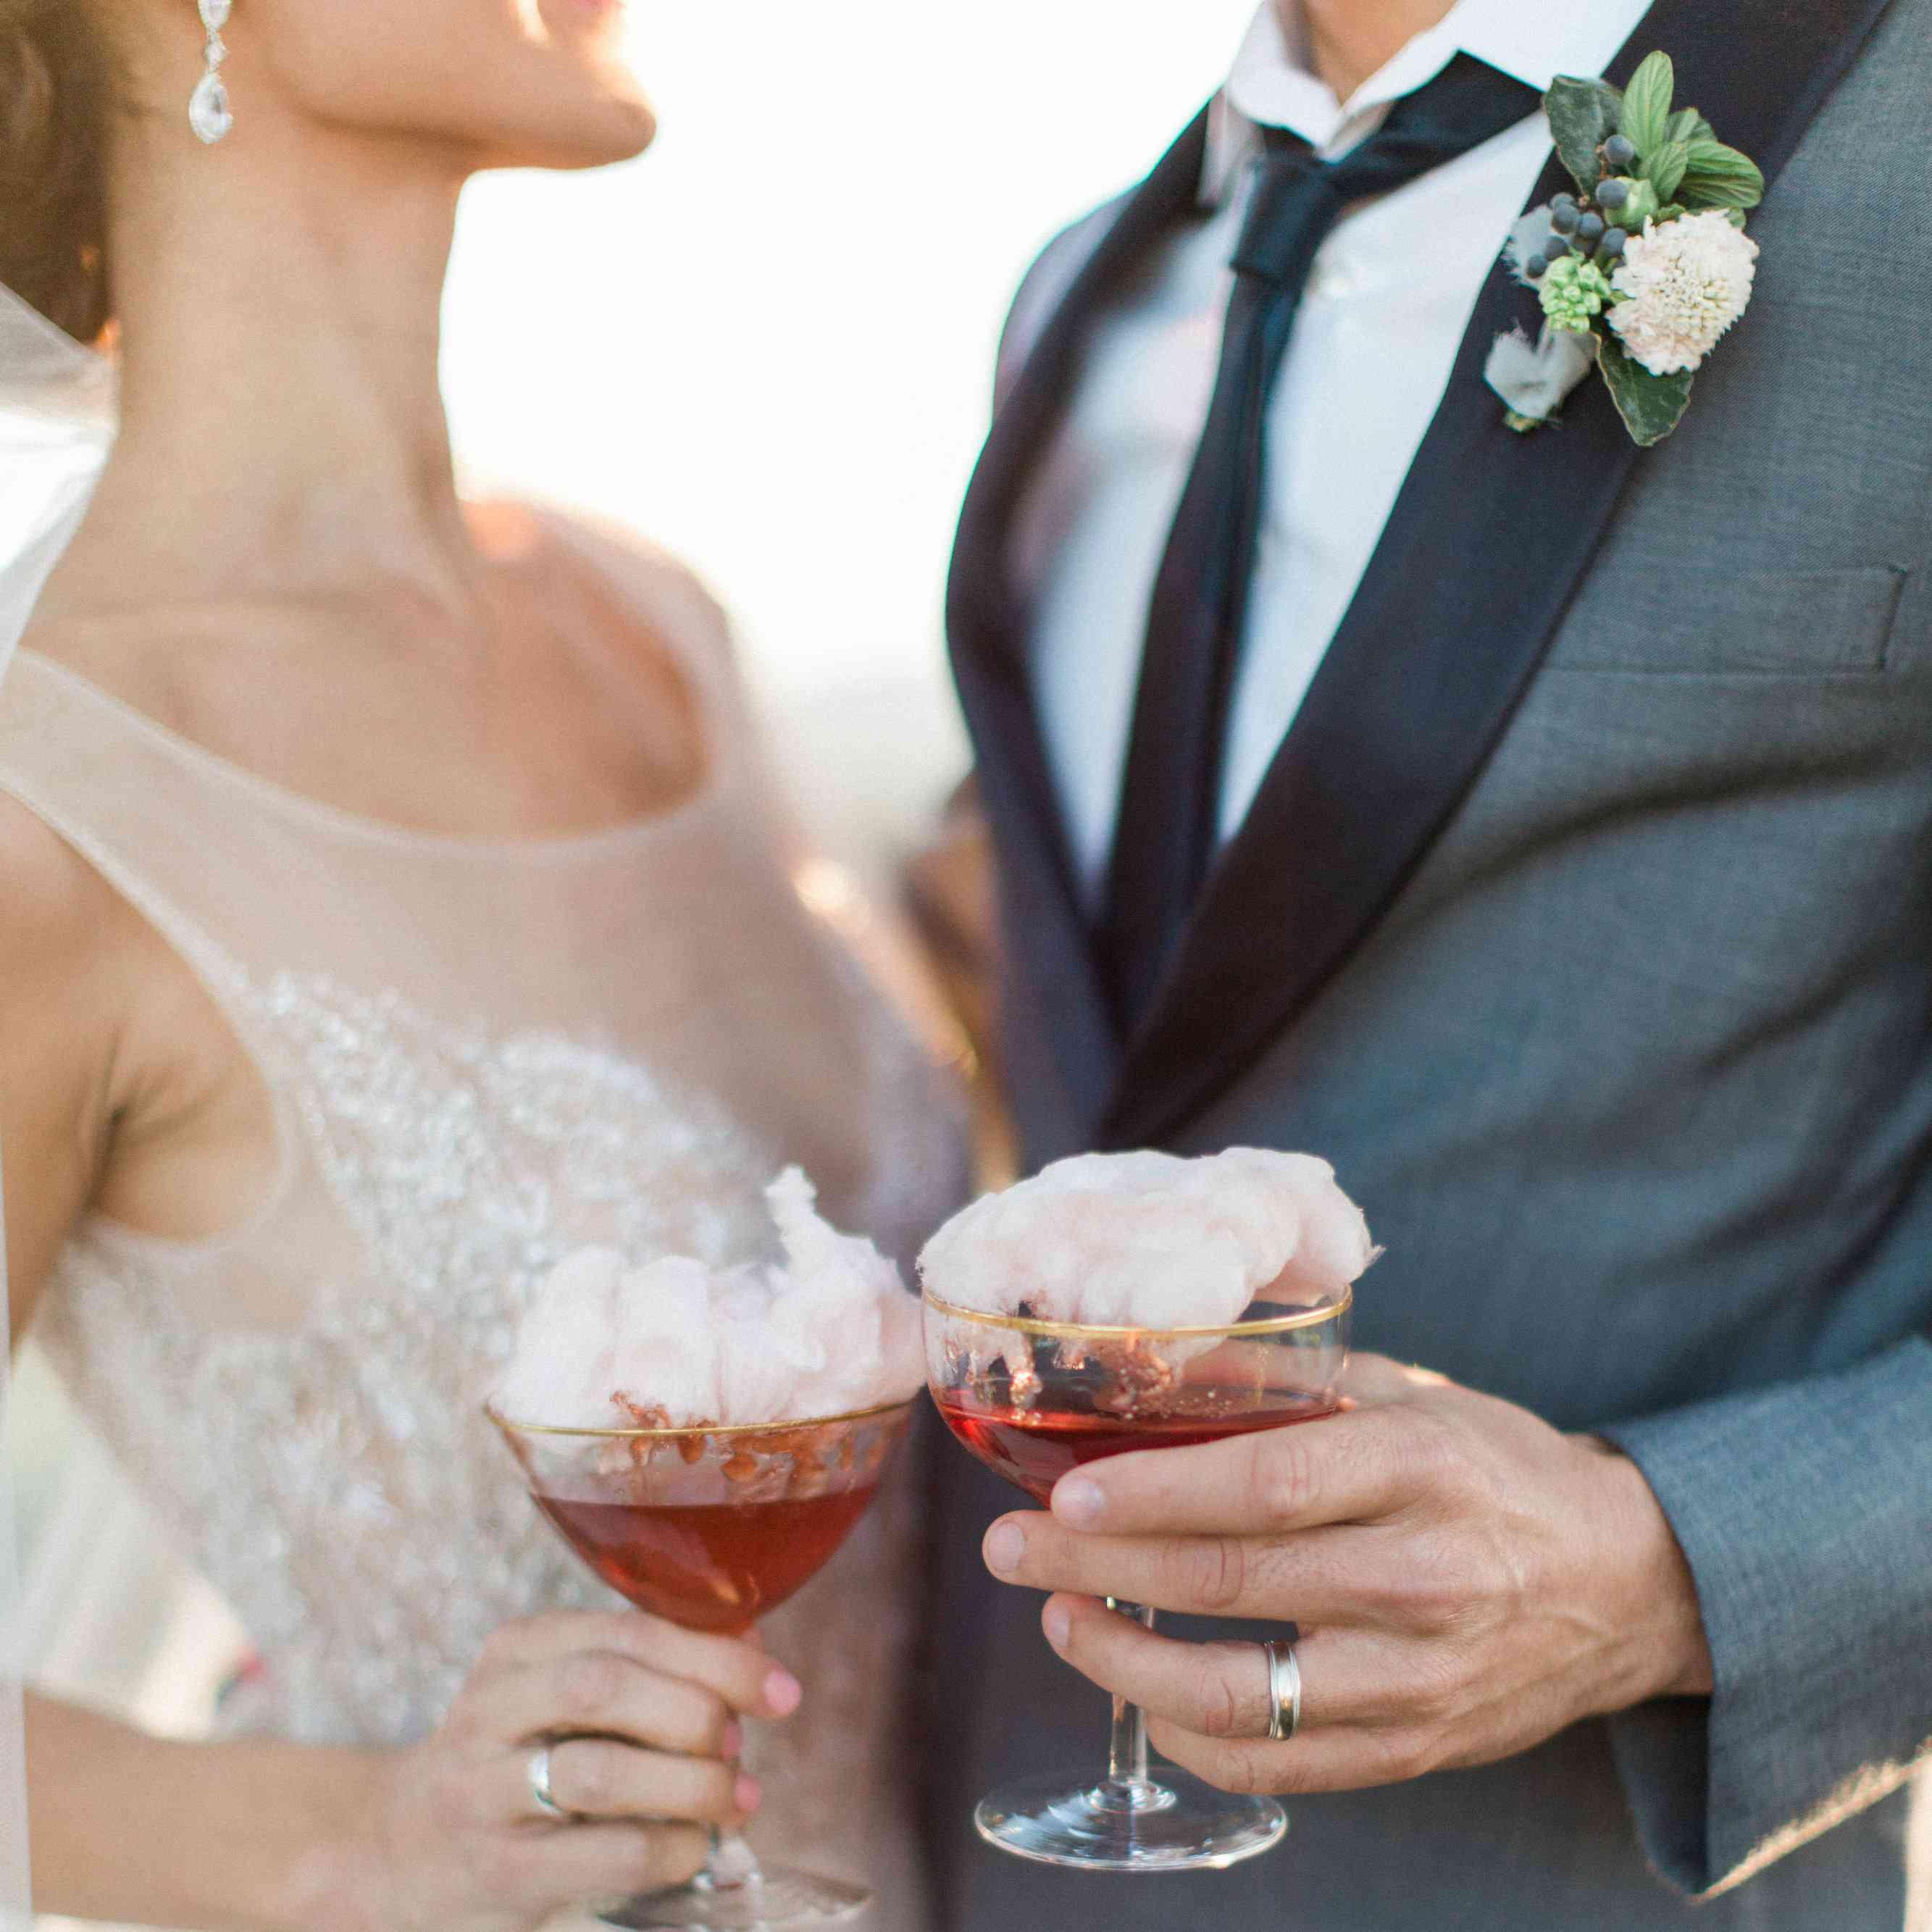 16 Fun Wedding Food Ideas From Real Weddings